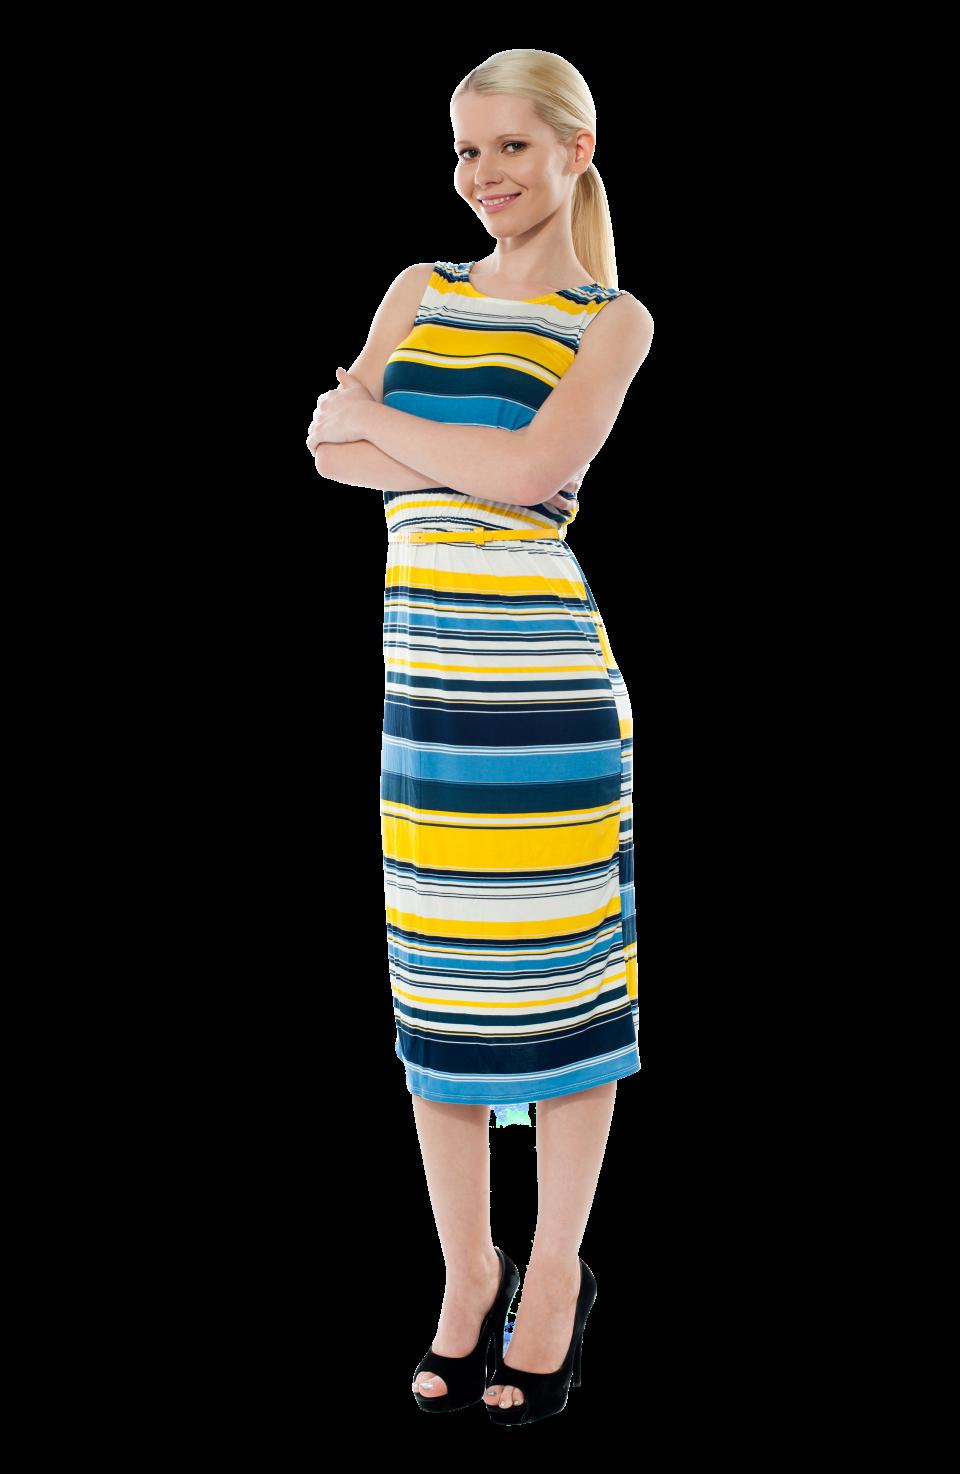 Fashion Girl PNG Image